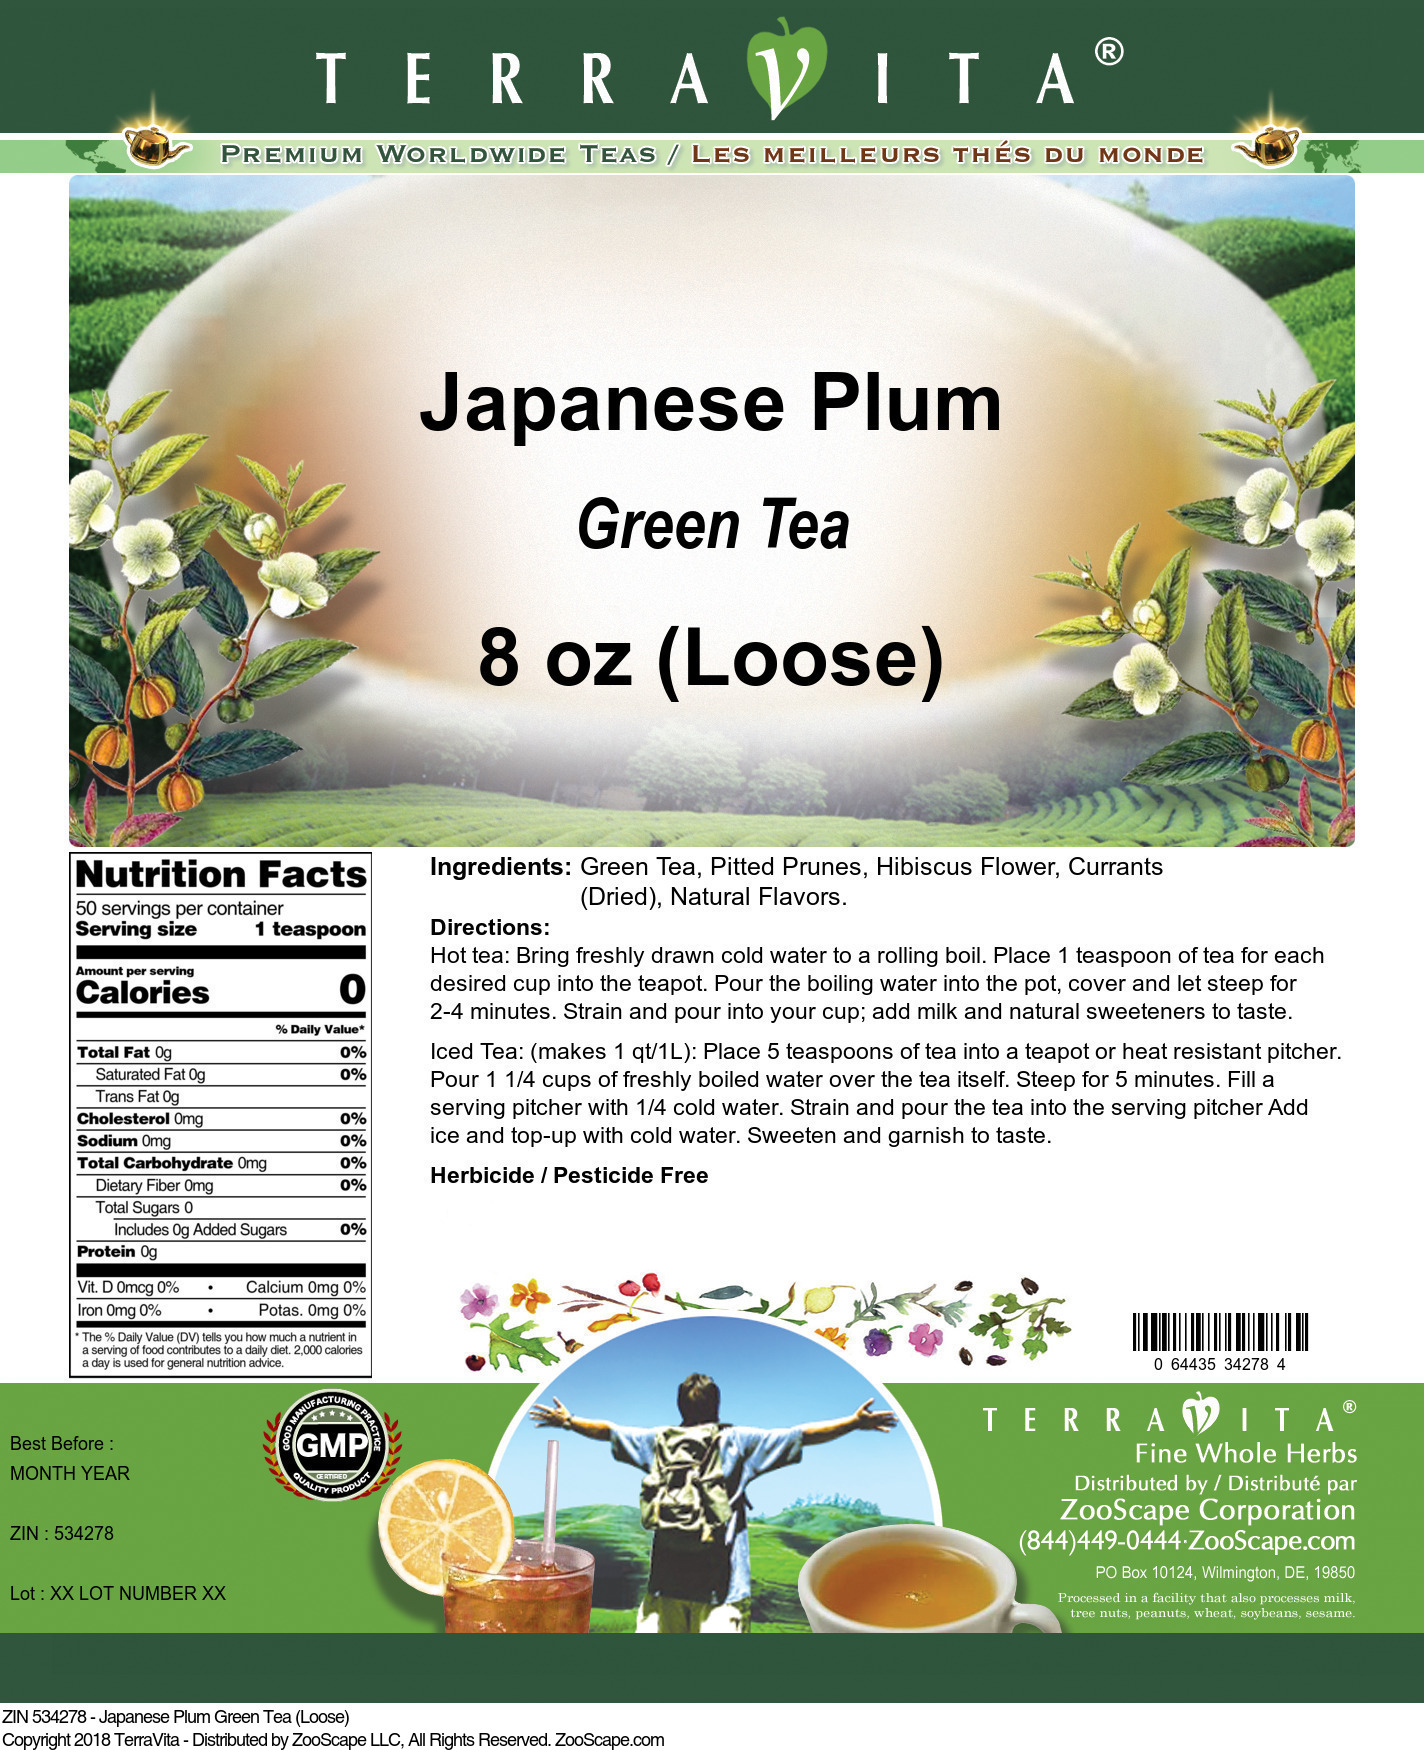 Japanese Plum Green Tea (Loose)